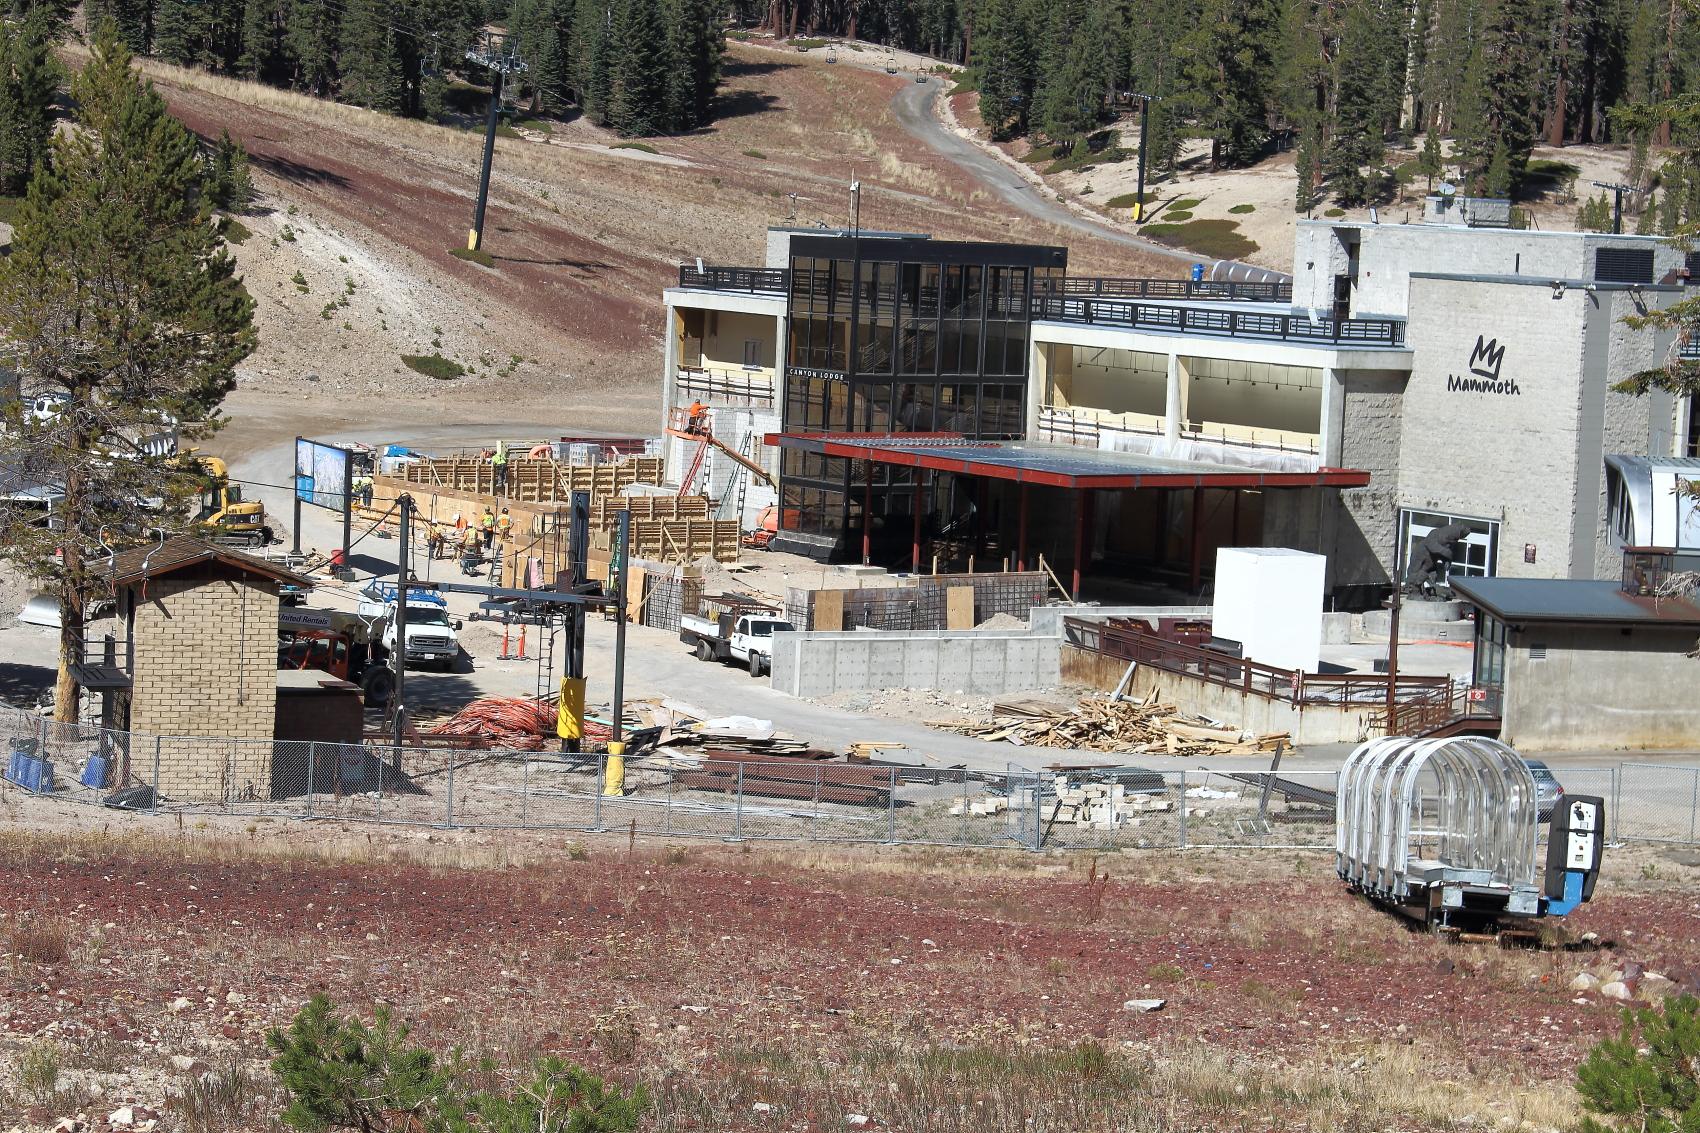 Canyon Lodge Remodel - Photo by Snowman